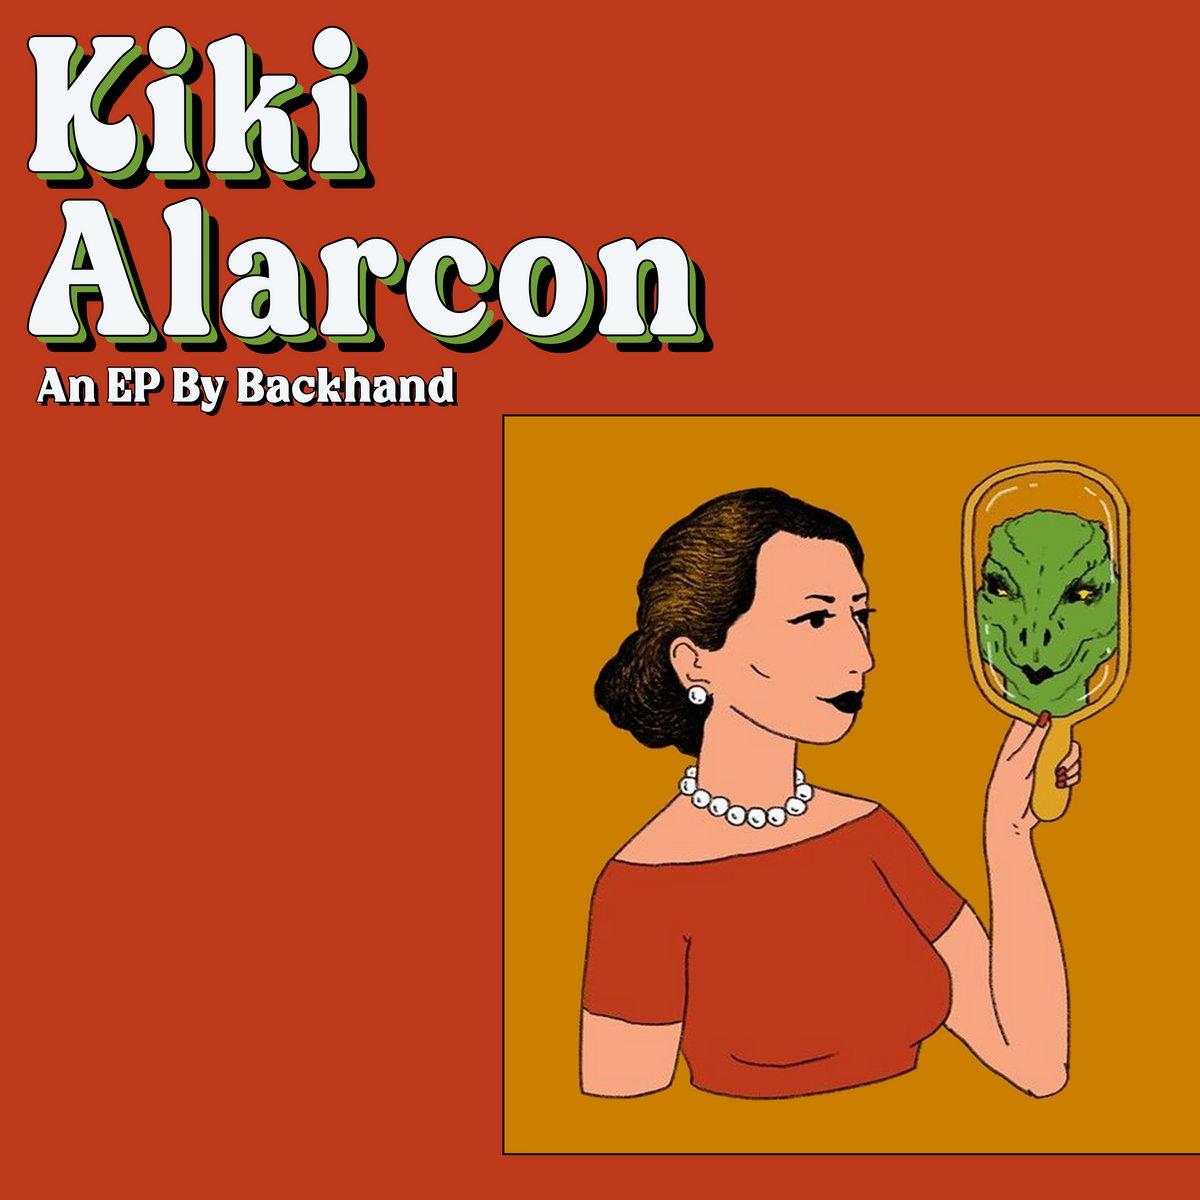 Backhand | Kiki Alarcon EP | UPHERE! Records